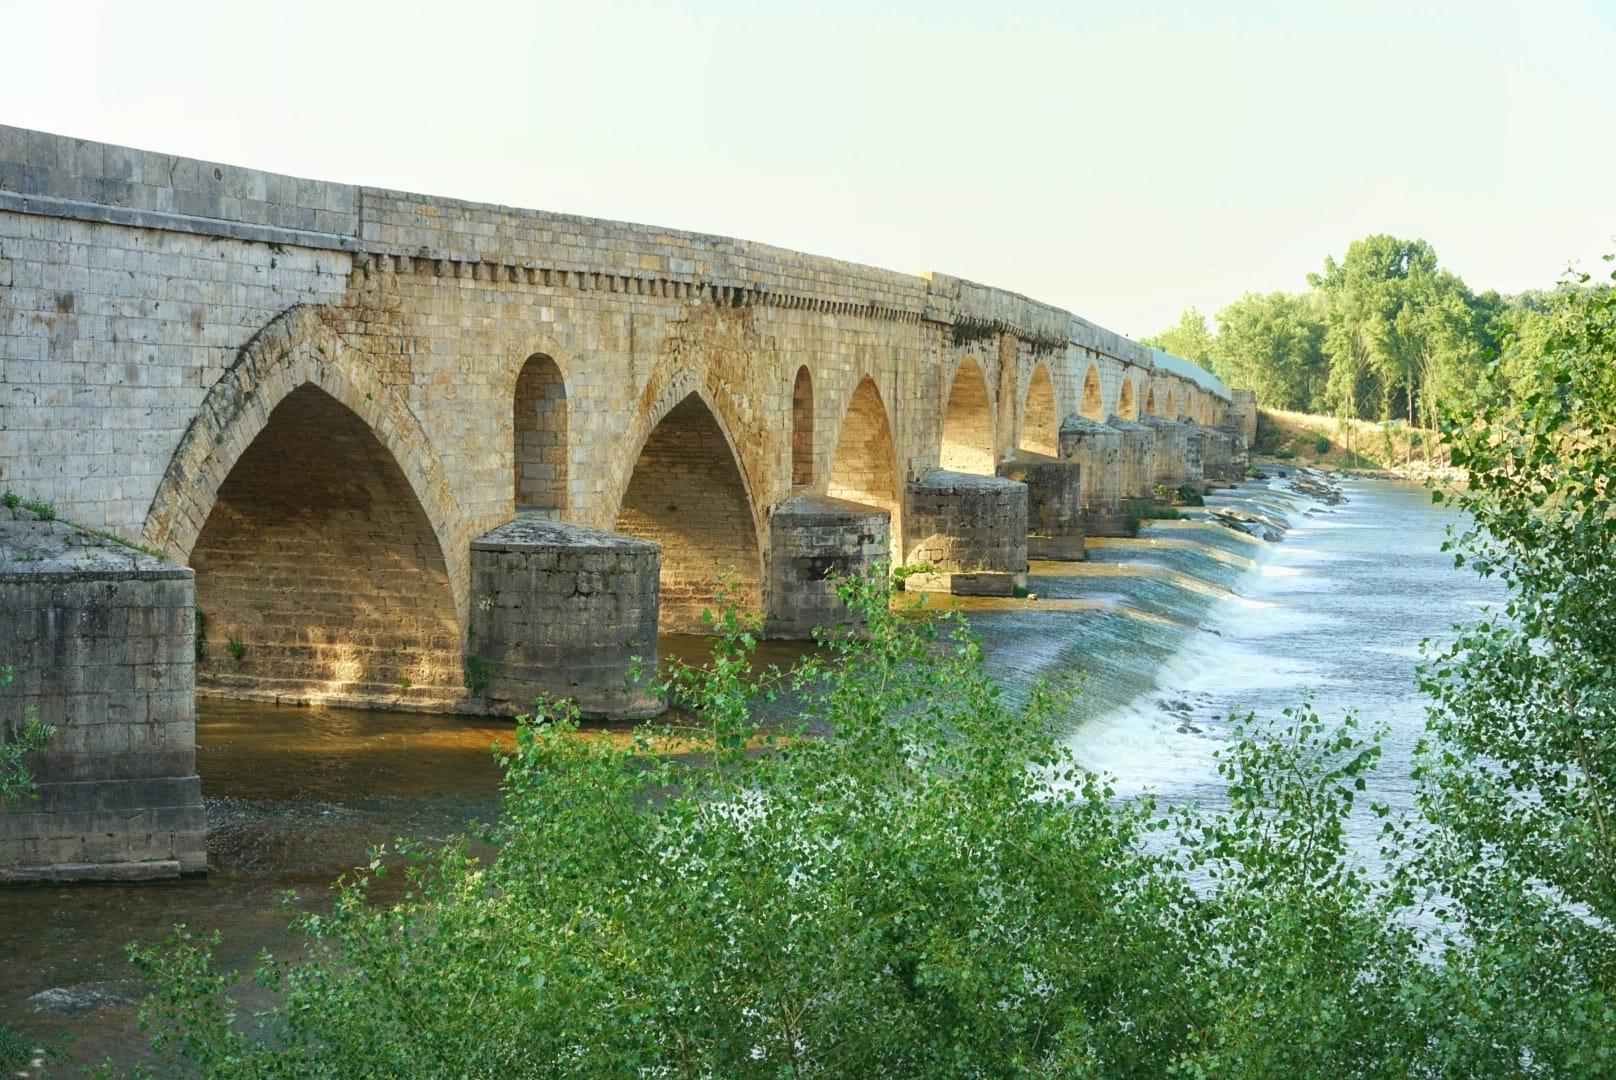 Puente románico de Toro. Las pilastras son de origen romano.